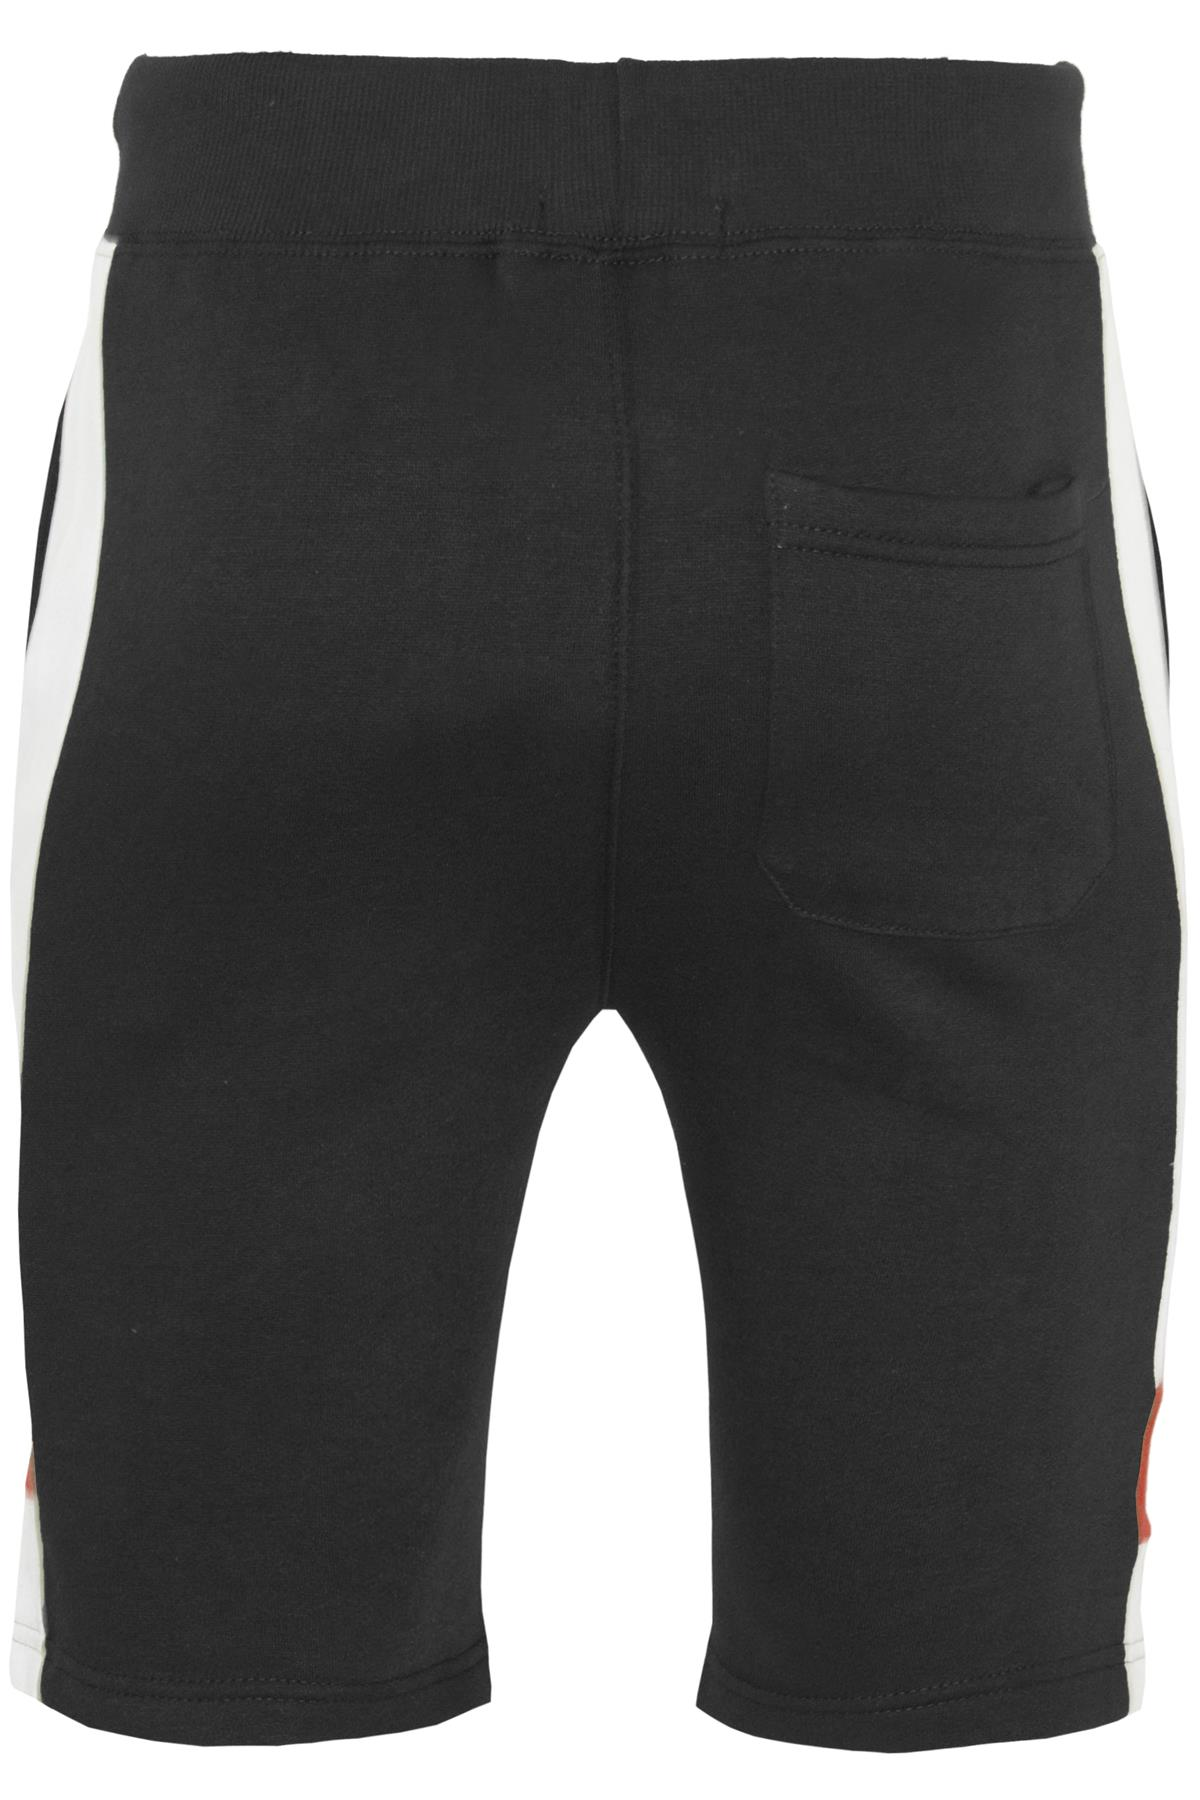 Mens-Contrast-Panel-Running-Summer-Side-Slit-Knee-Length-Fleece-Bottoms-Shorts thumbnail 11